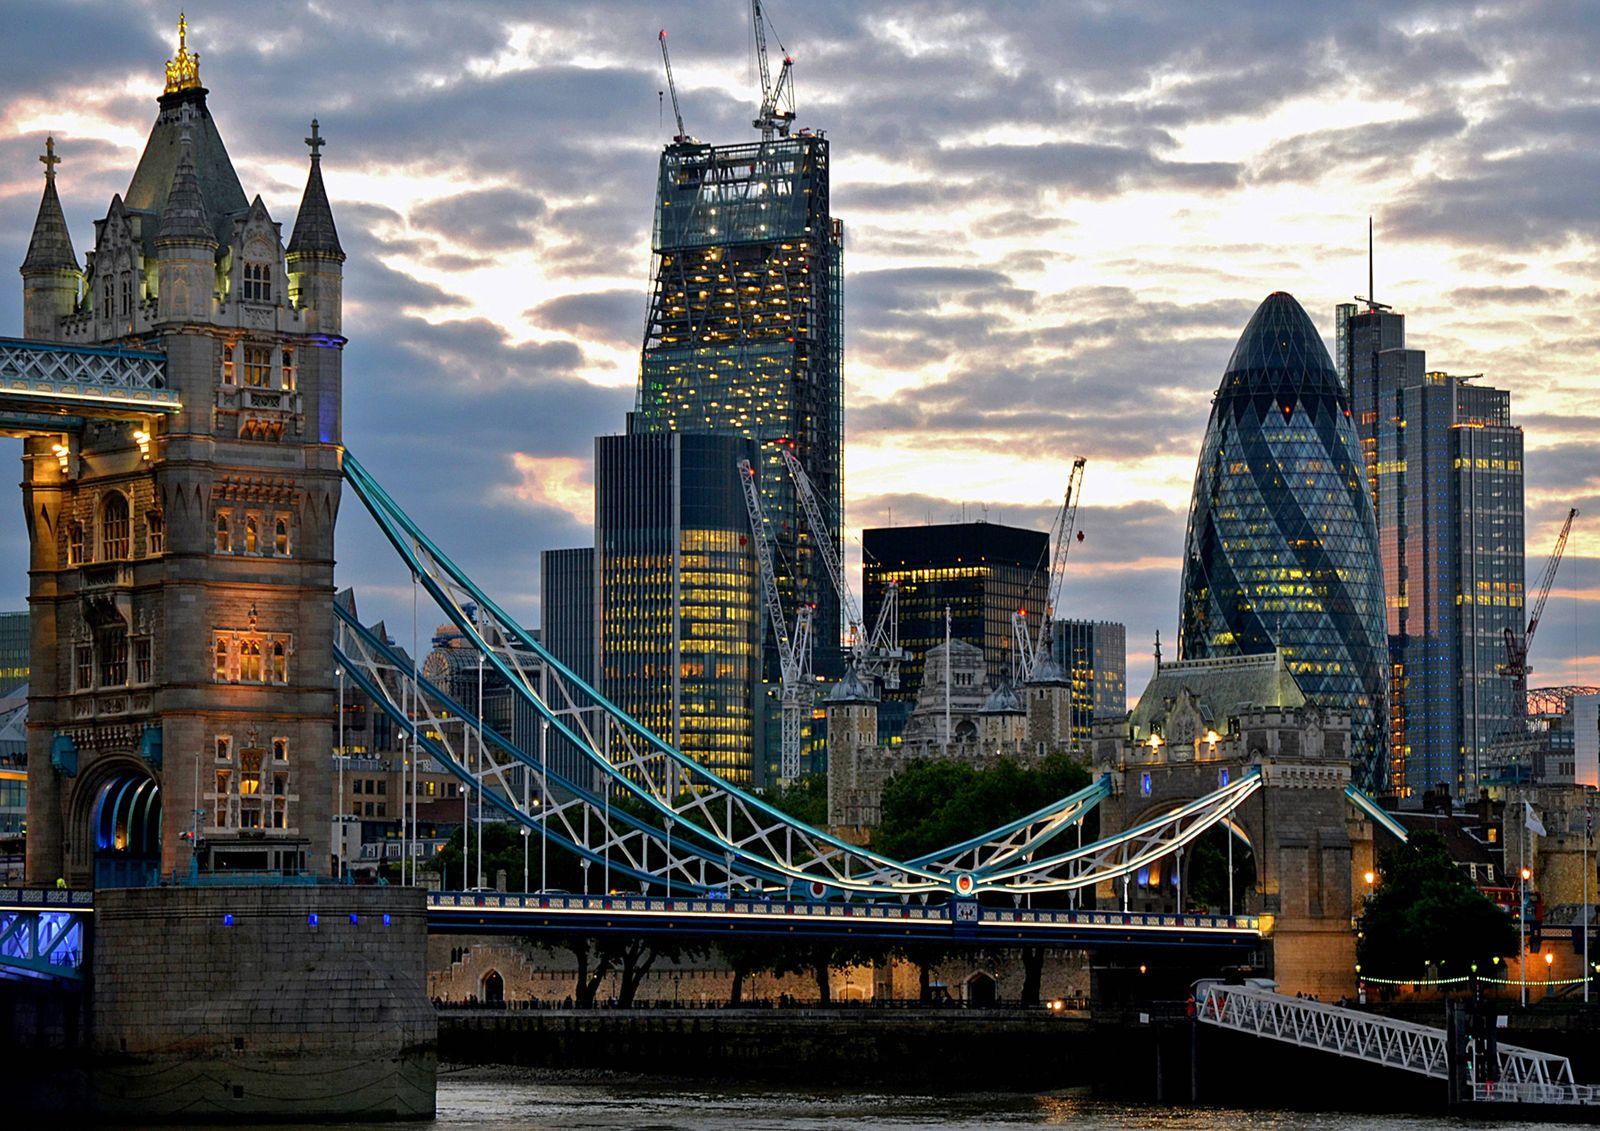 City Of London zur blauen Stunde *** City of London at the blue hour PUBLICATIONxINxGERxSUIxAUTxONLY